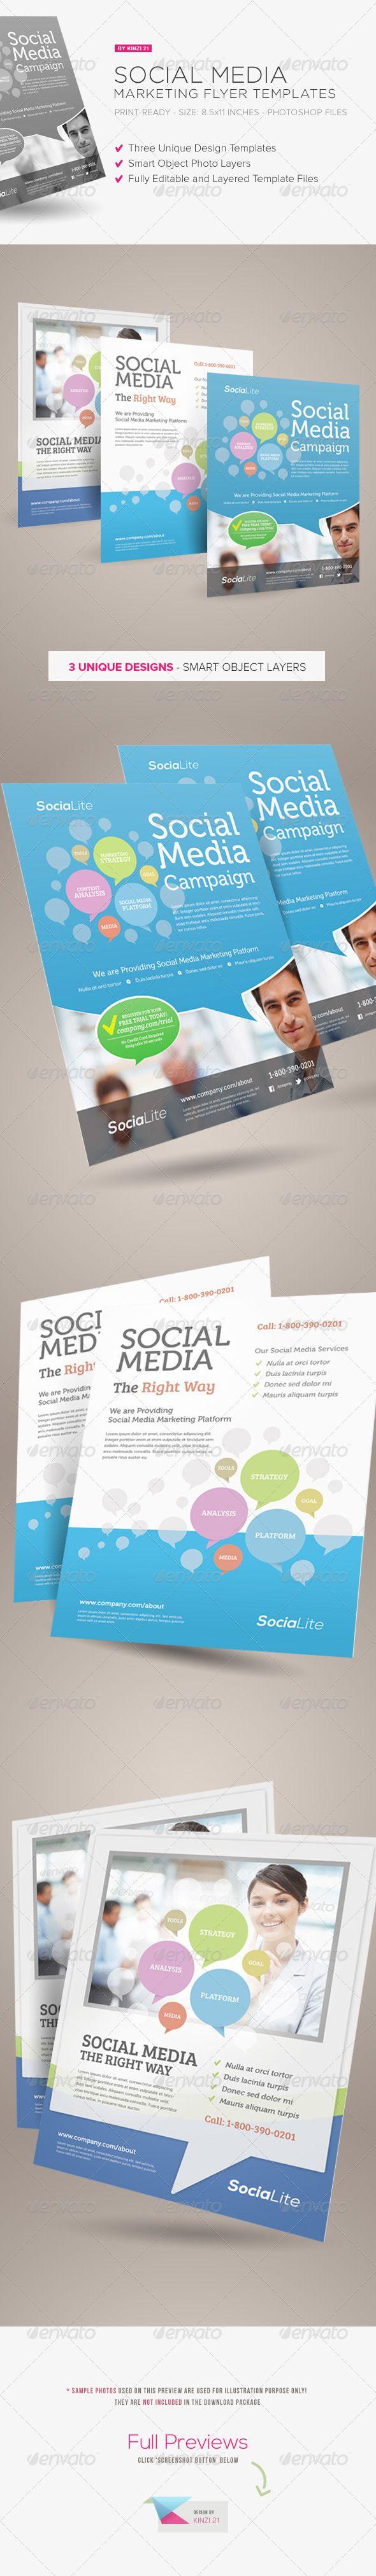 97 best images about Slick Sheets on Pinterest | Fonts, Mobile app ...